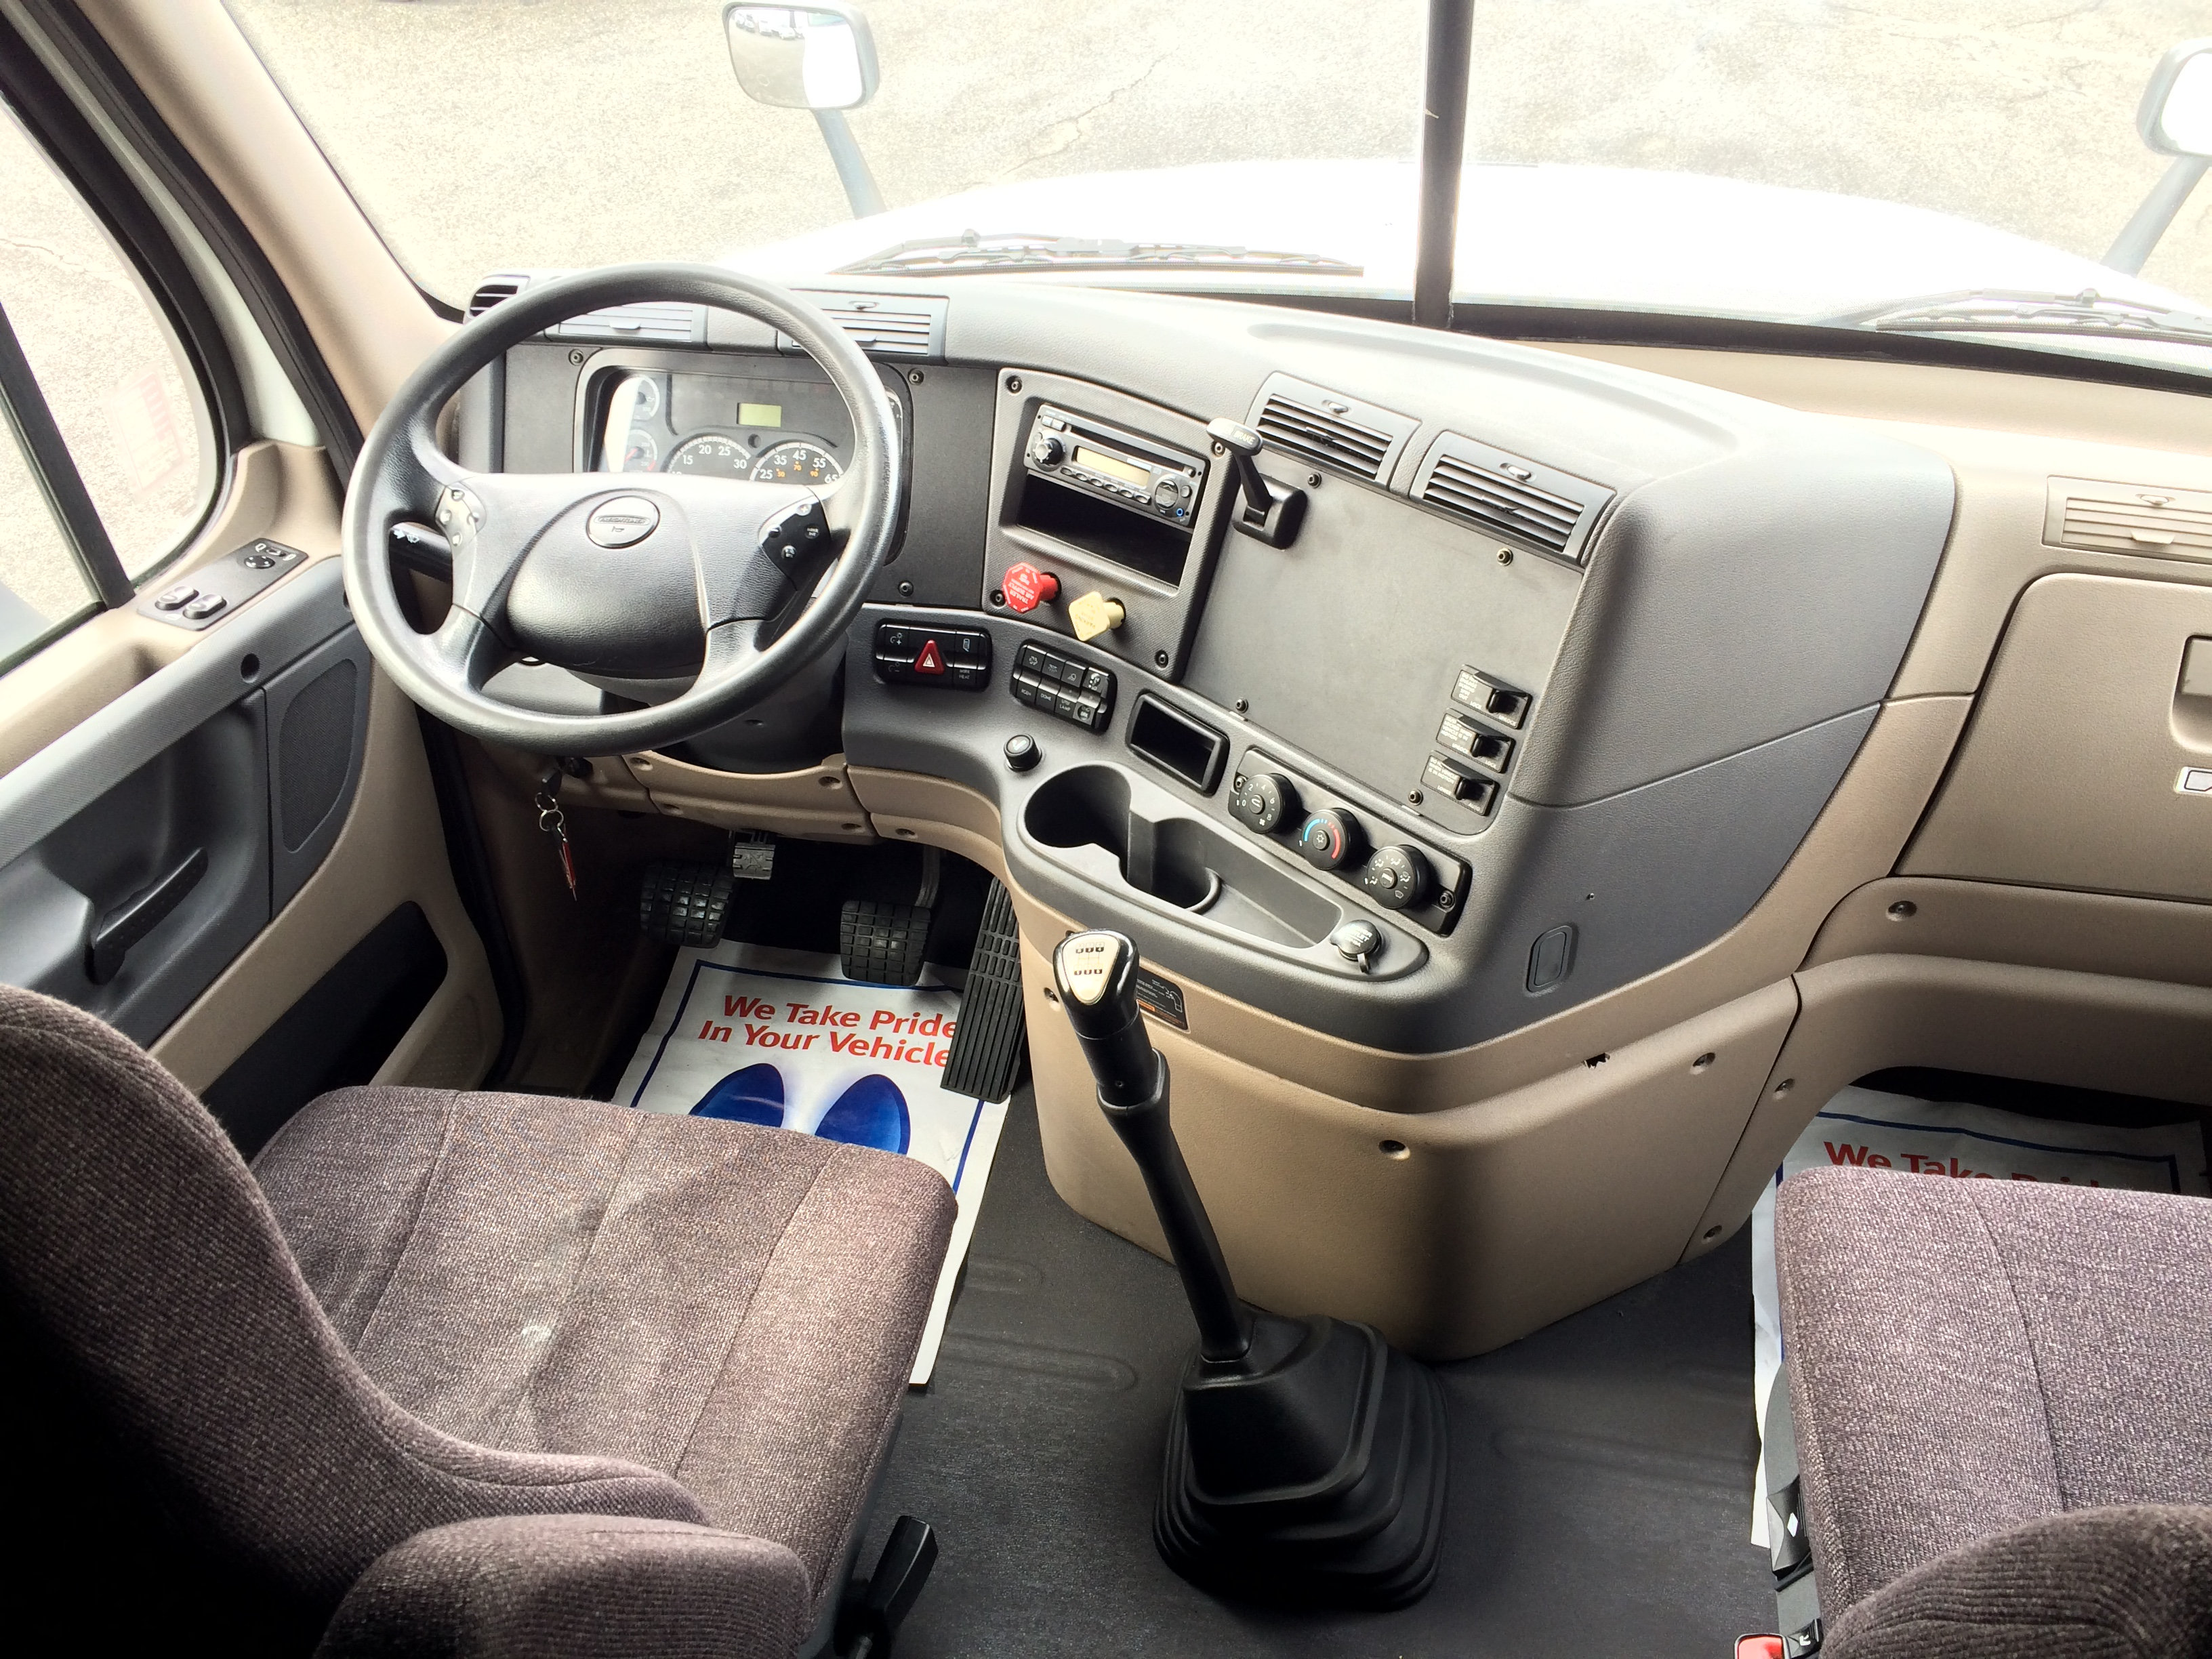 2014 Freightliner Cascadia Website